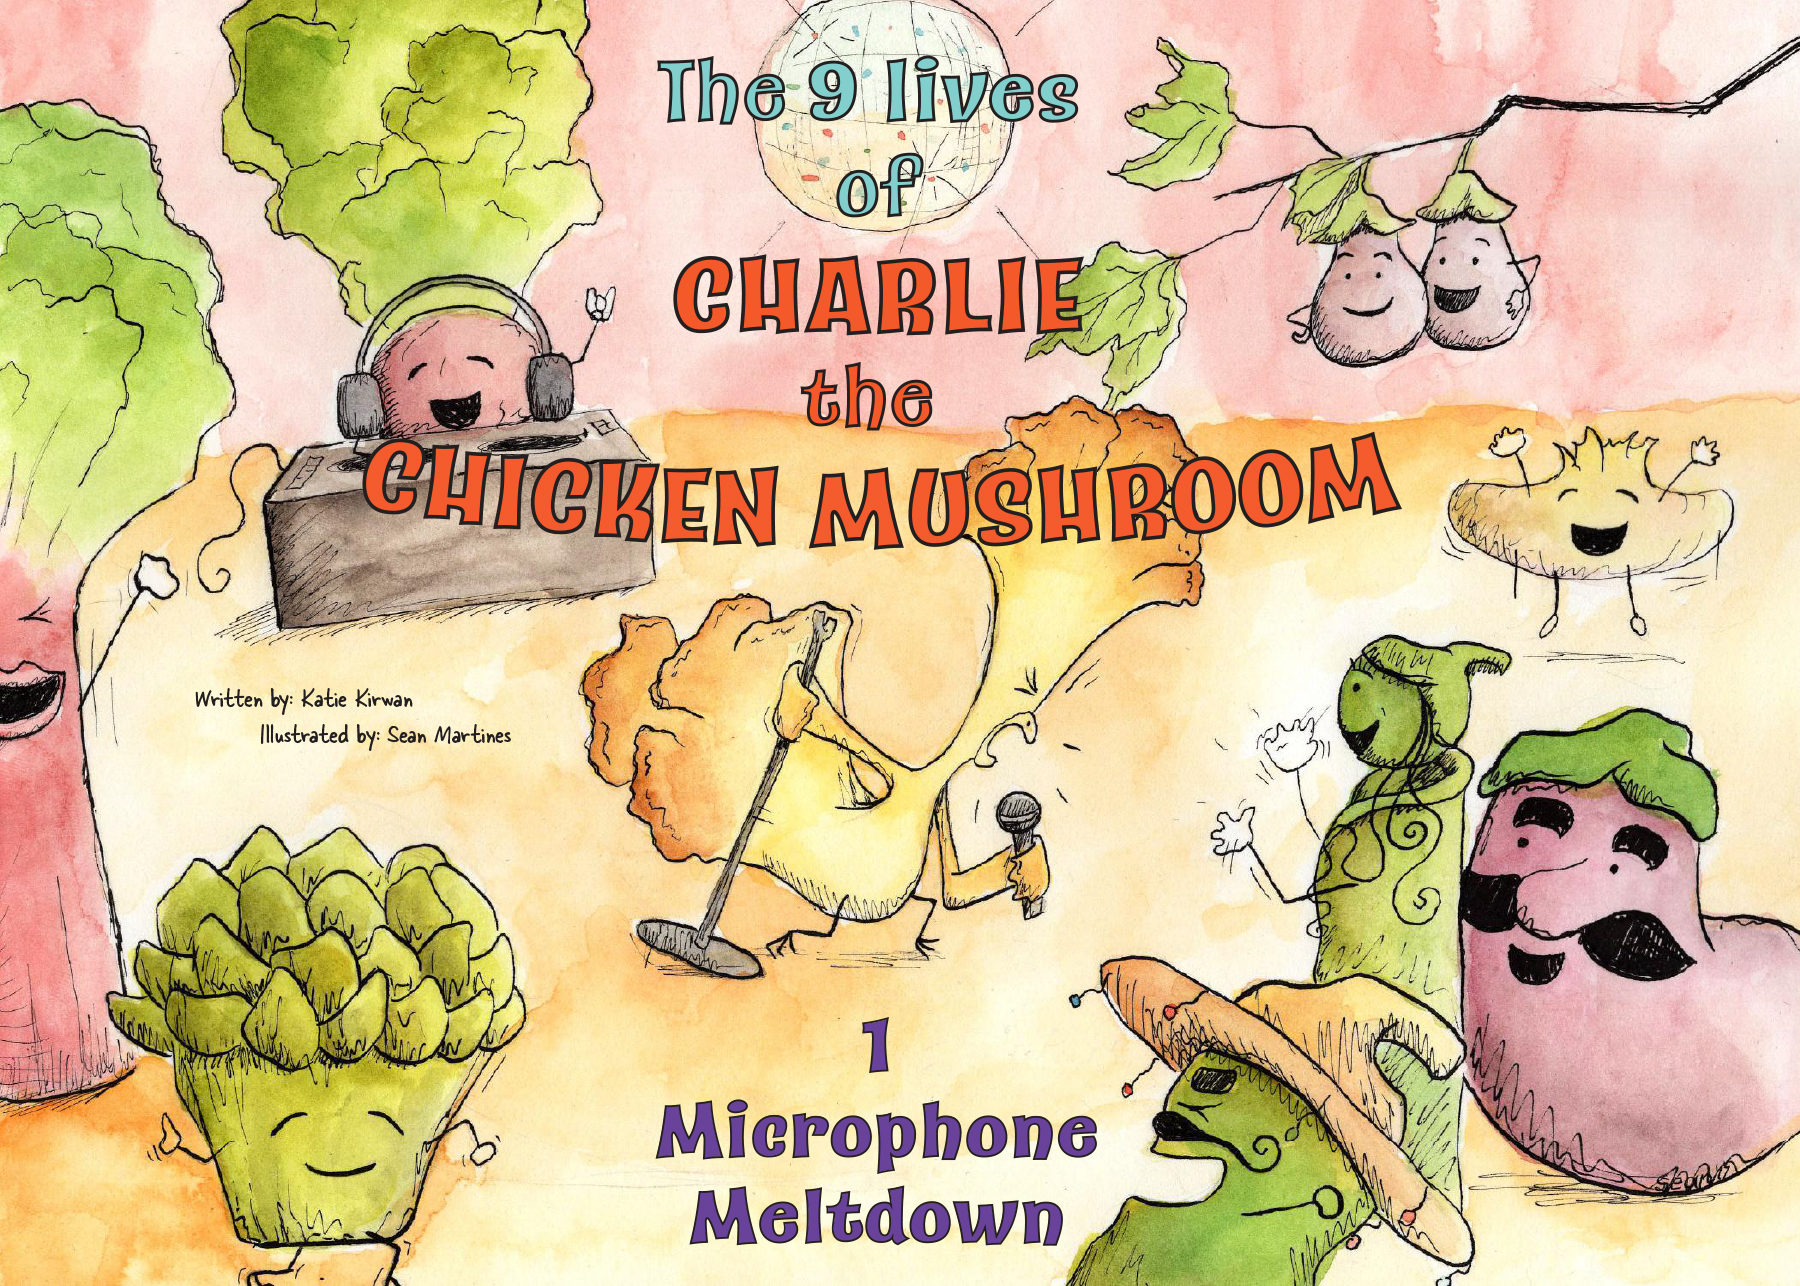 CharlieTheChickenMushroom (1).jpg